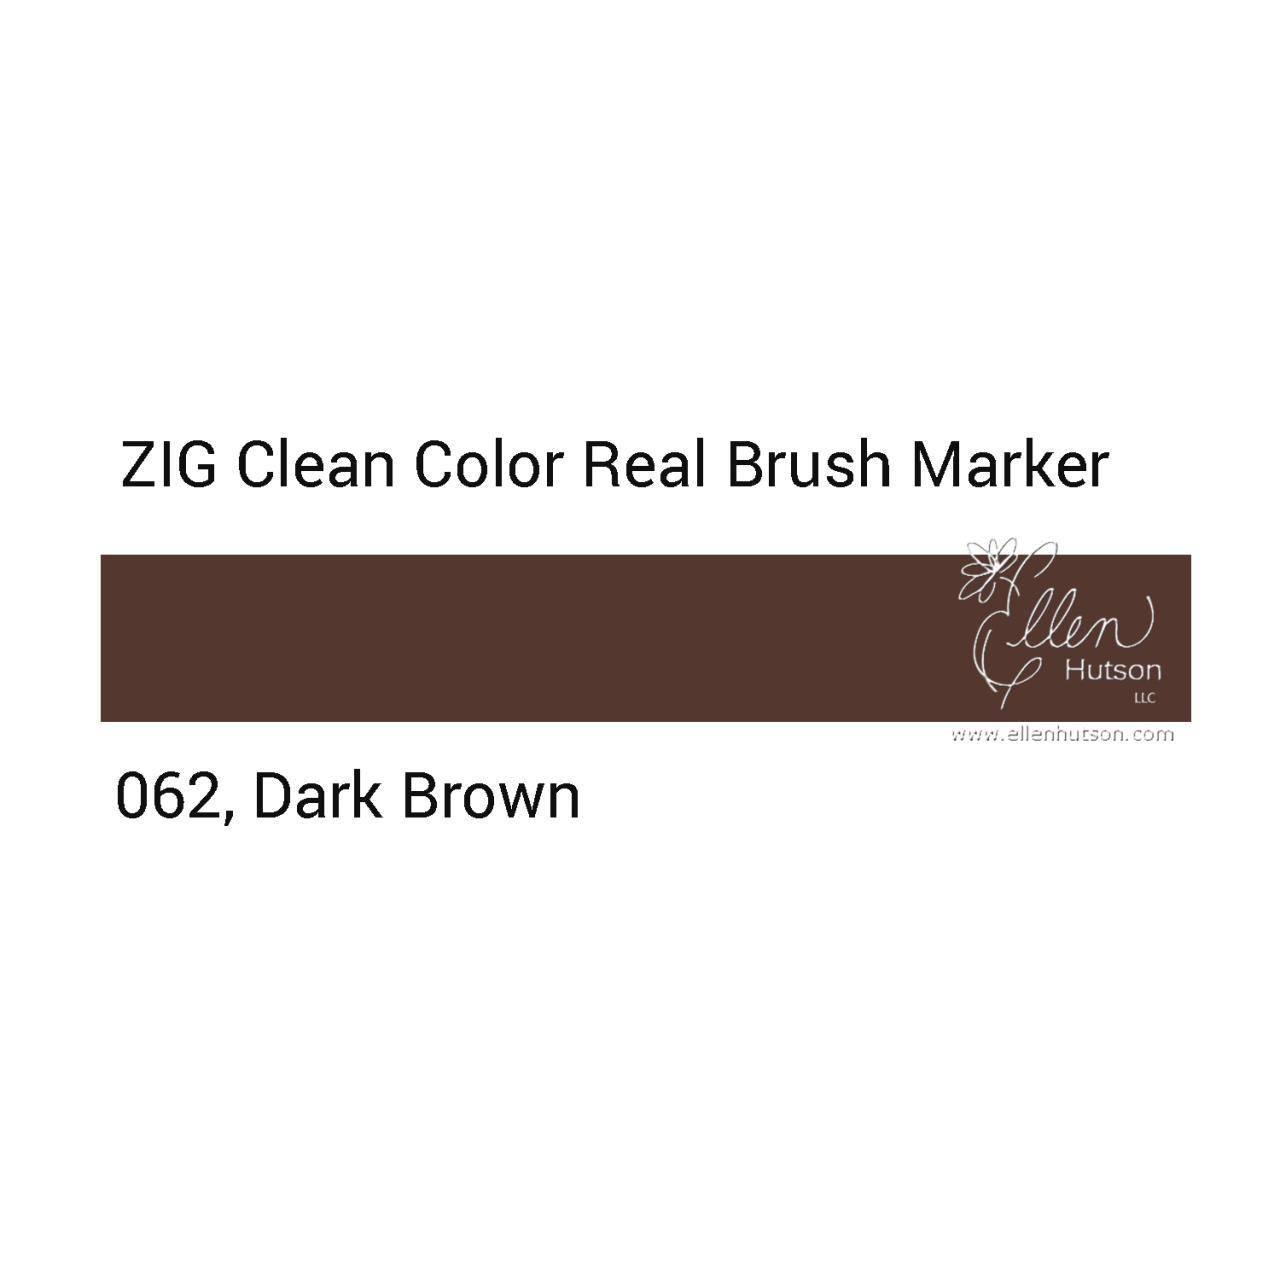 ZIG Clean Color Real Brush Marker Dark Brown 062